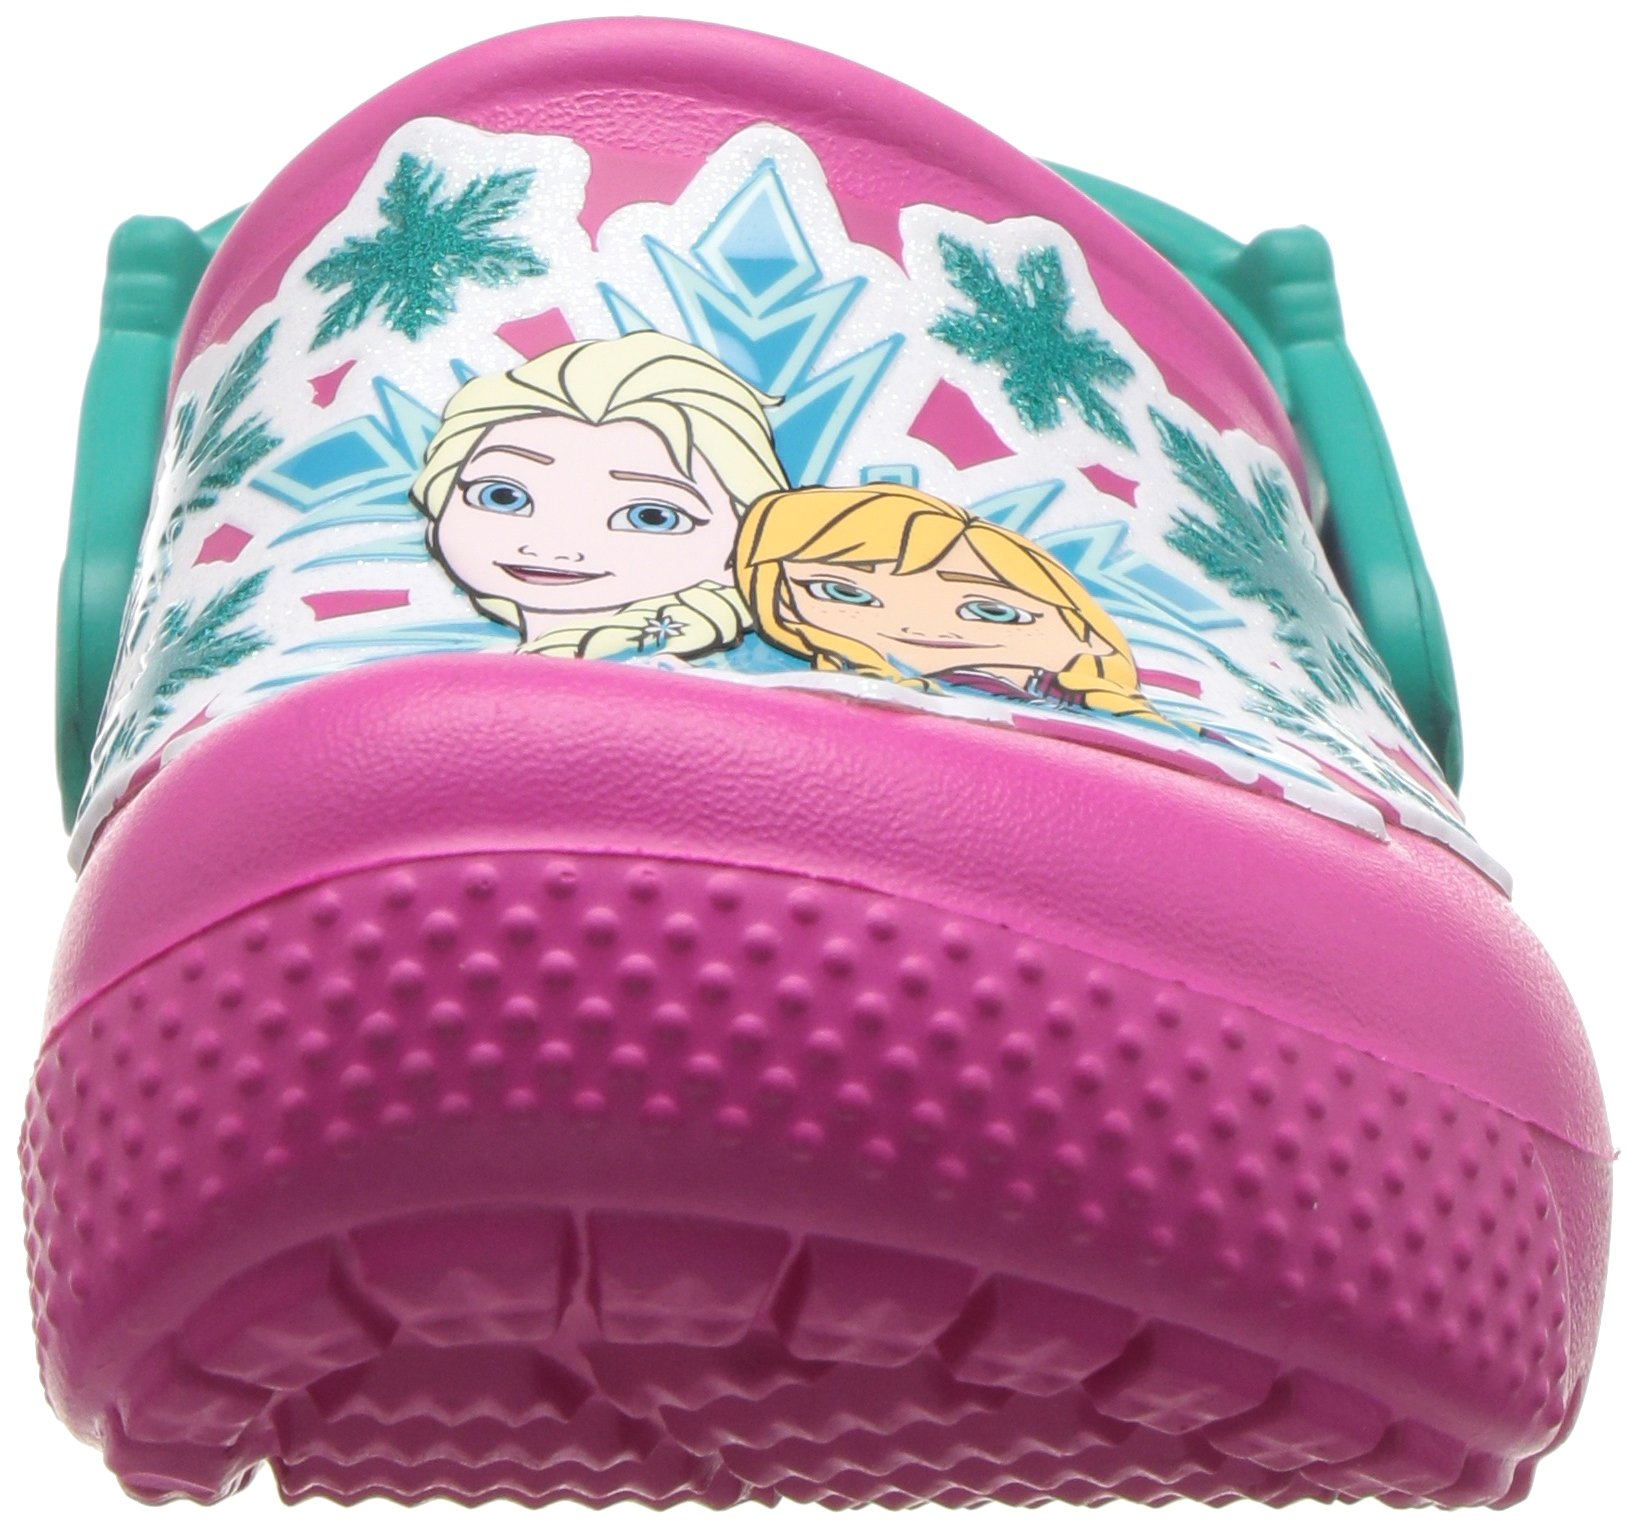 Crocs Girls' Fun Lab Frozen Clog K, Candy Pink, 10 M US Little Kid by Crocs (Image #4)